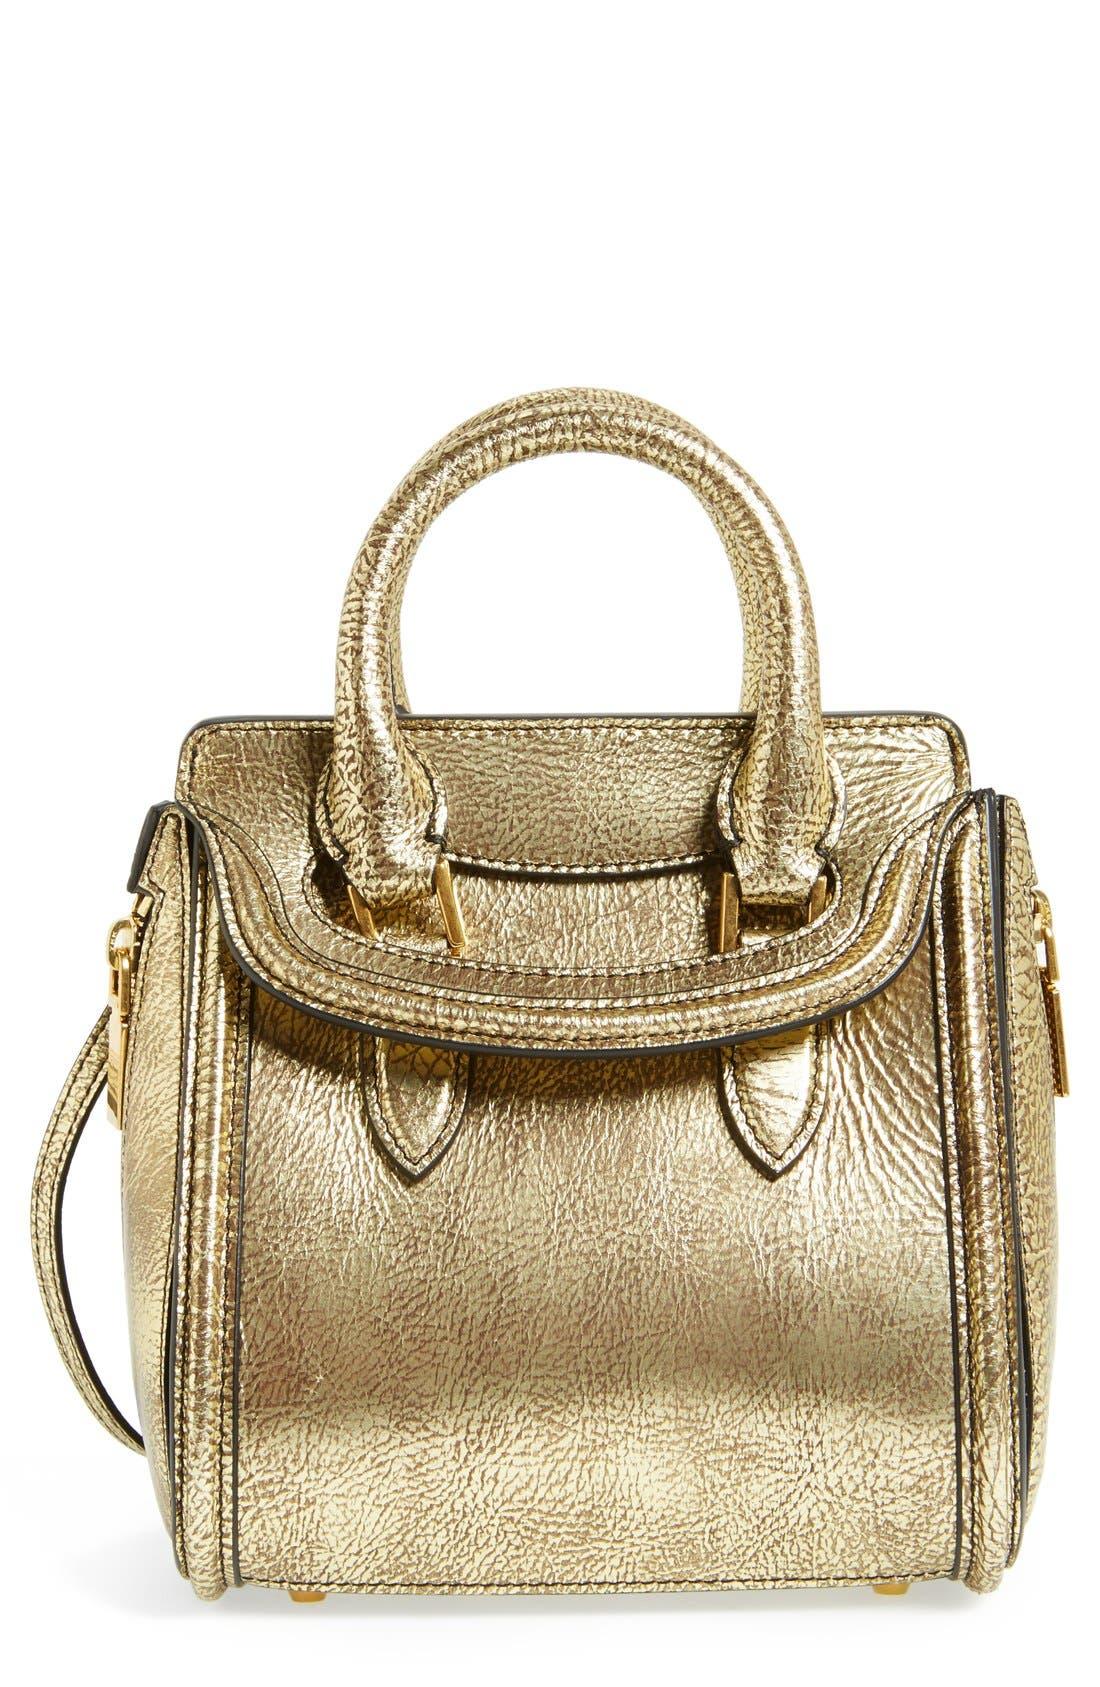 Main Image - Alexander McQueen 'Mini Heroine' Metallic Lambskin Leather Crossbody Bag